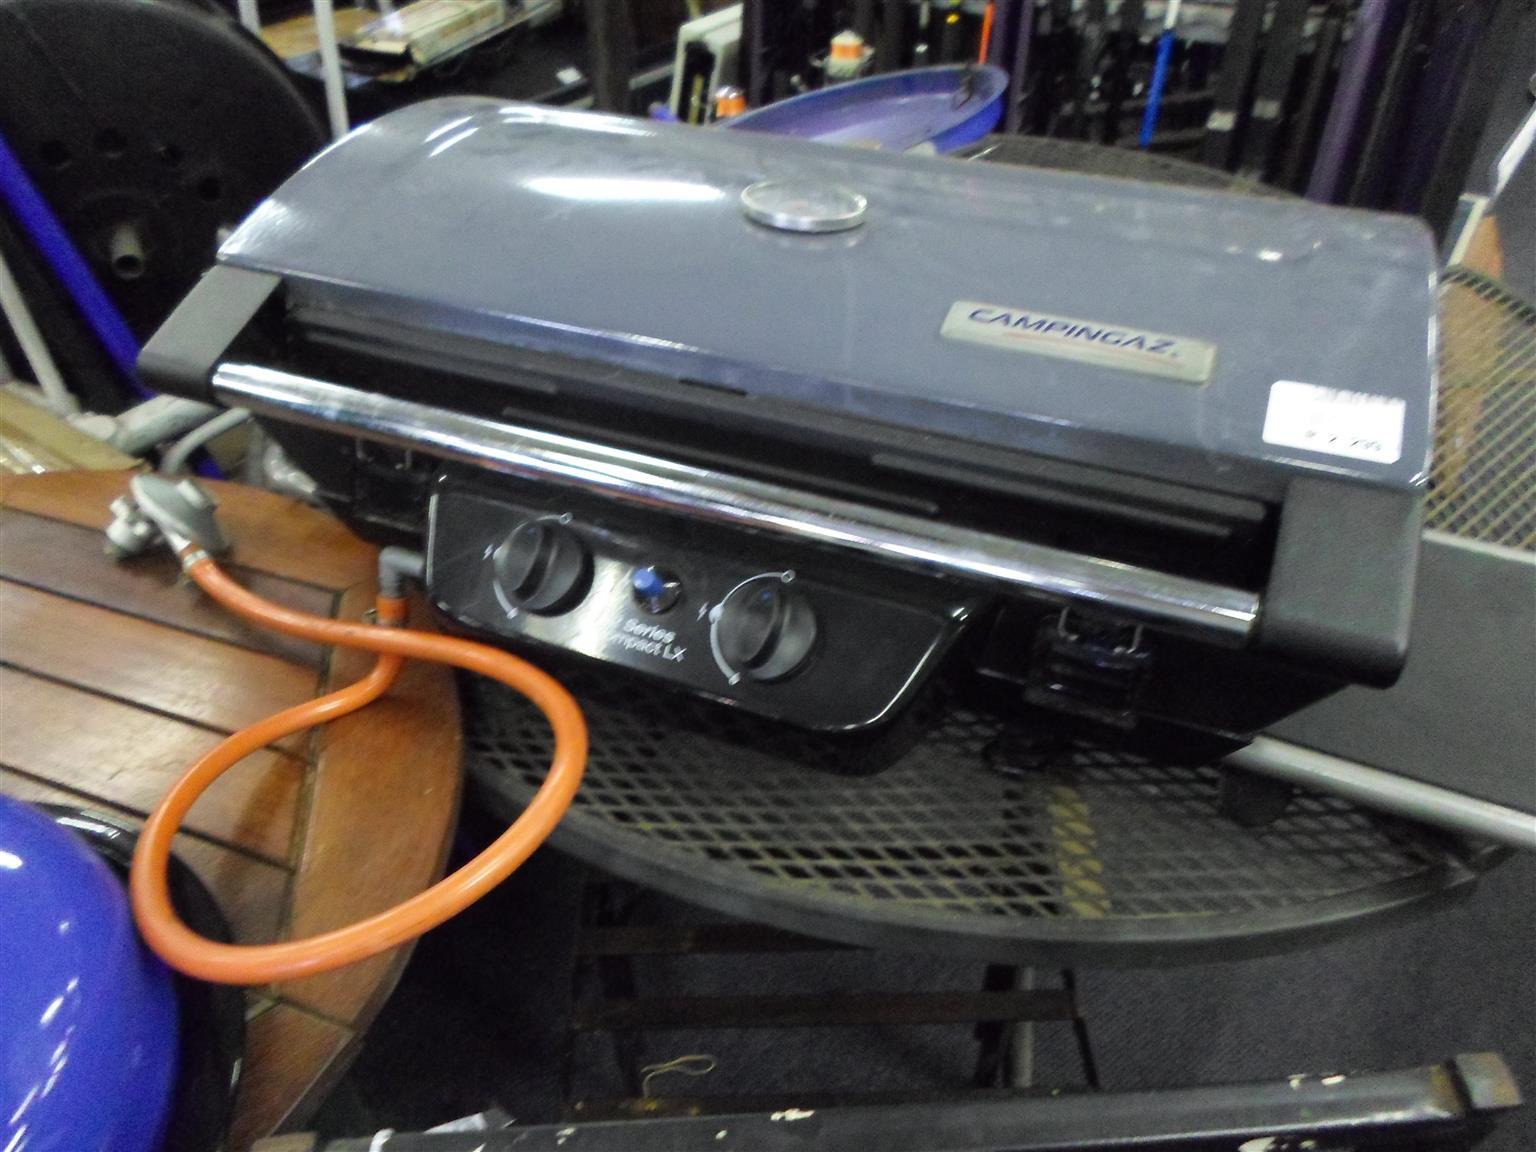 Campingaz 2 Series Compact LX Gas Braai